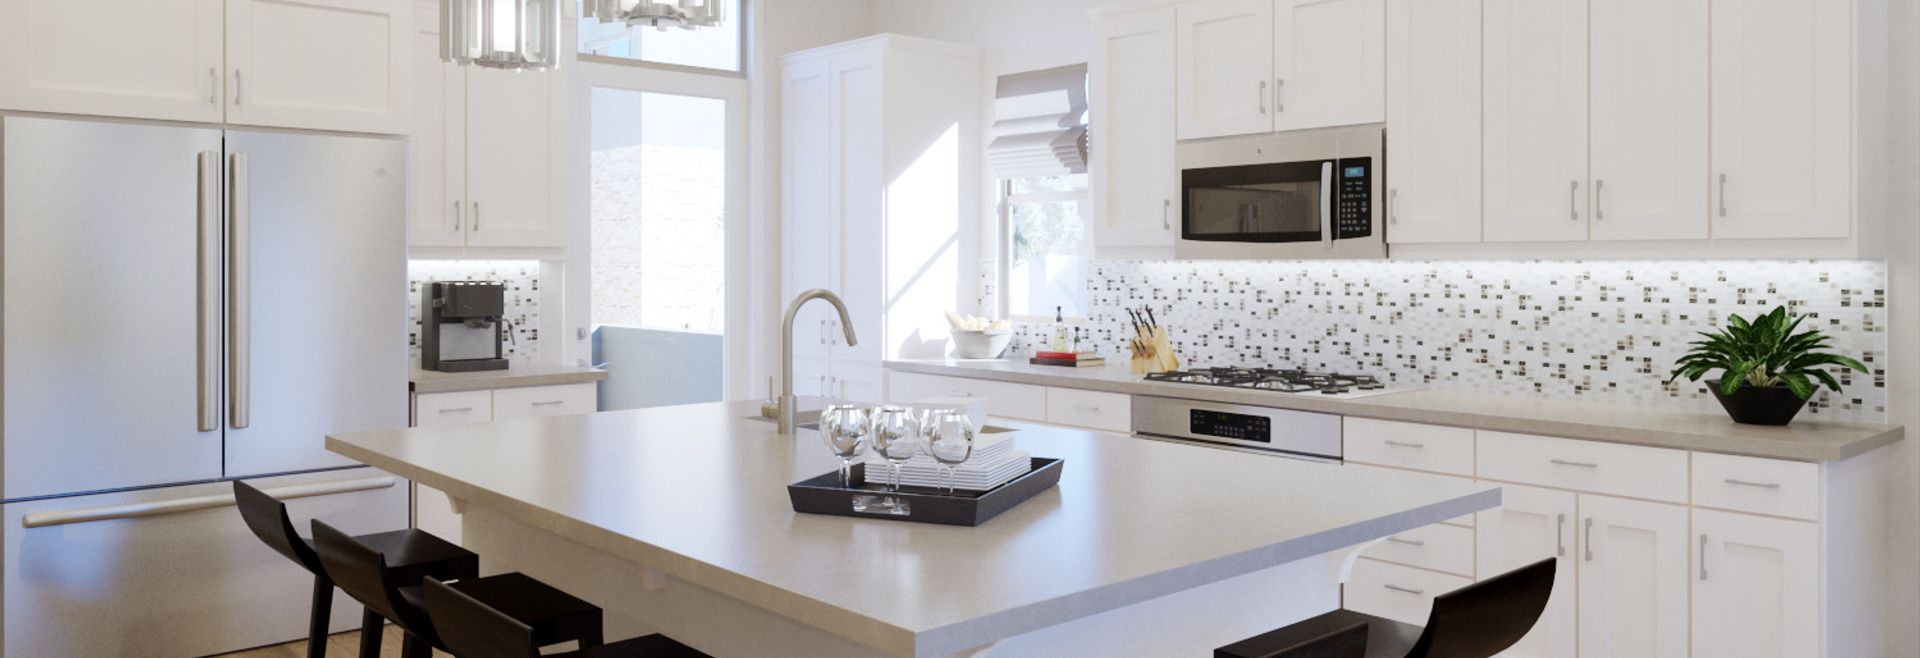 Trilogy Summerlin Radiant Virtually Staged Kitchen